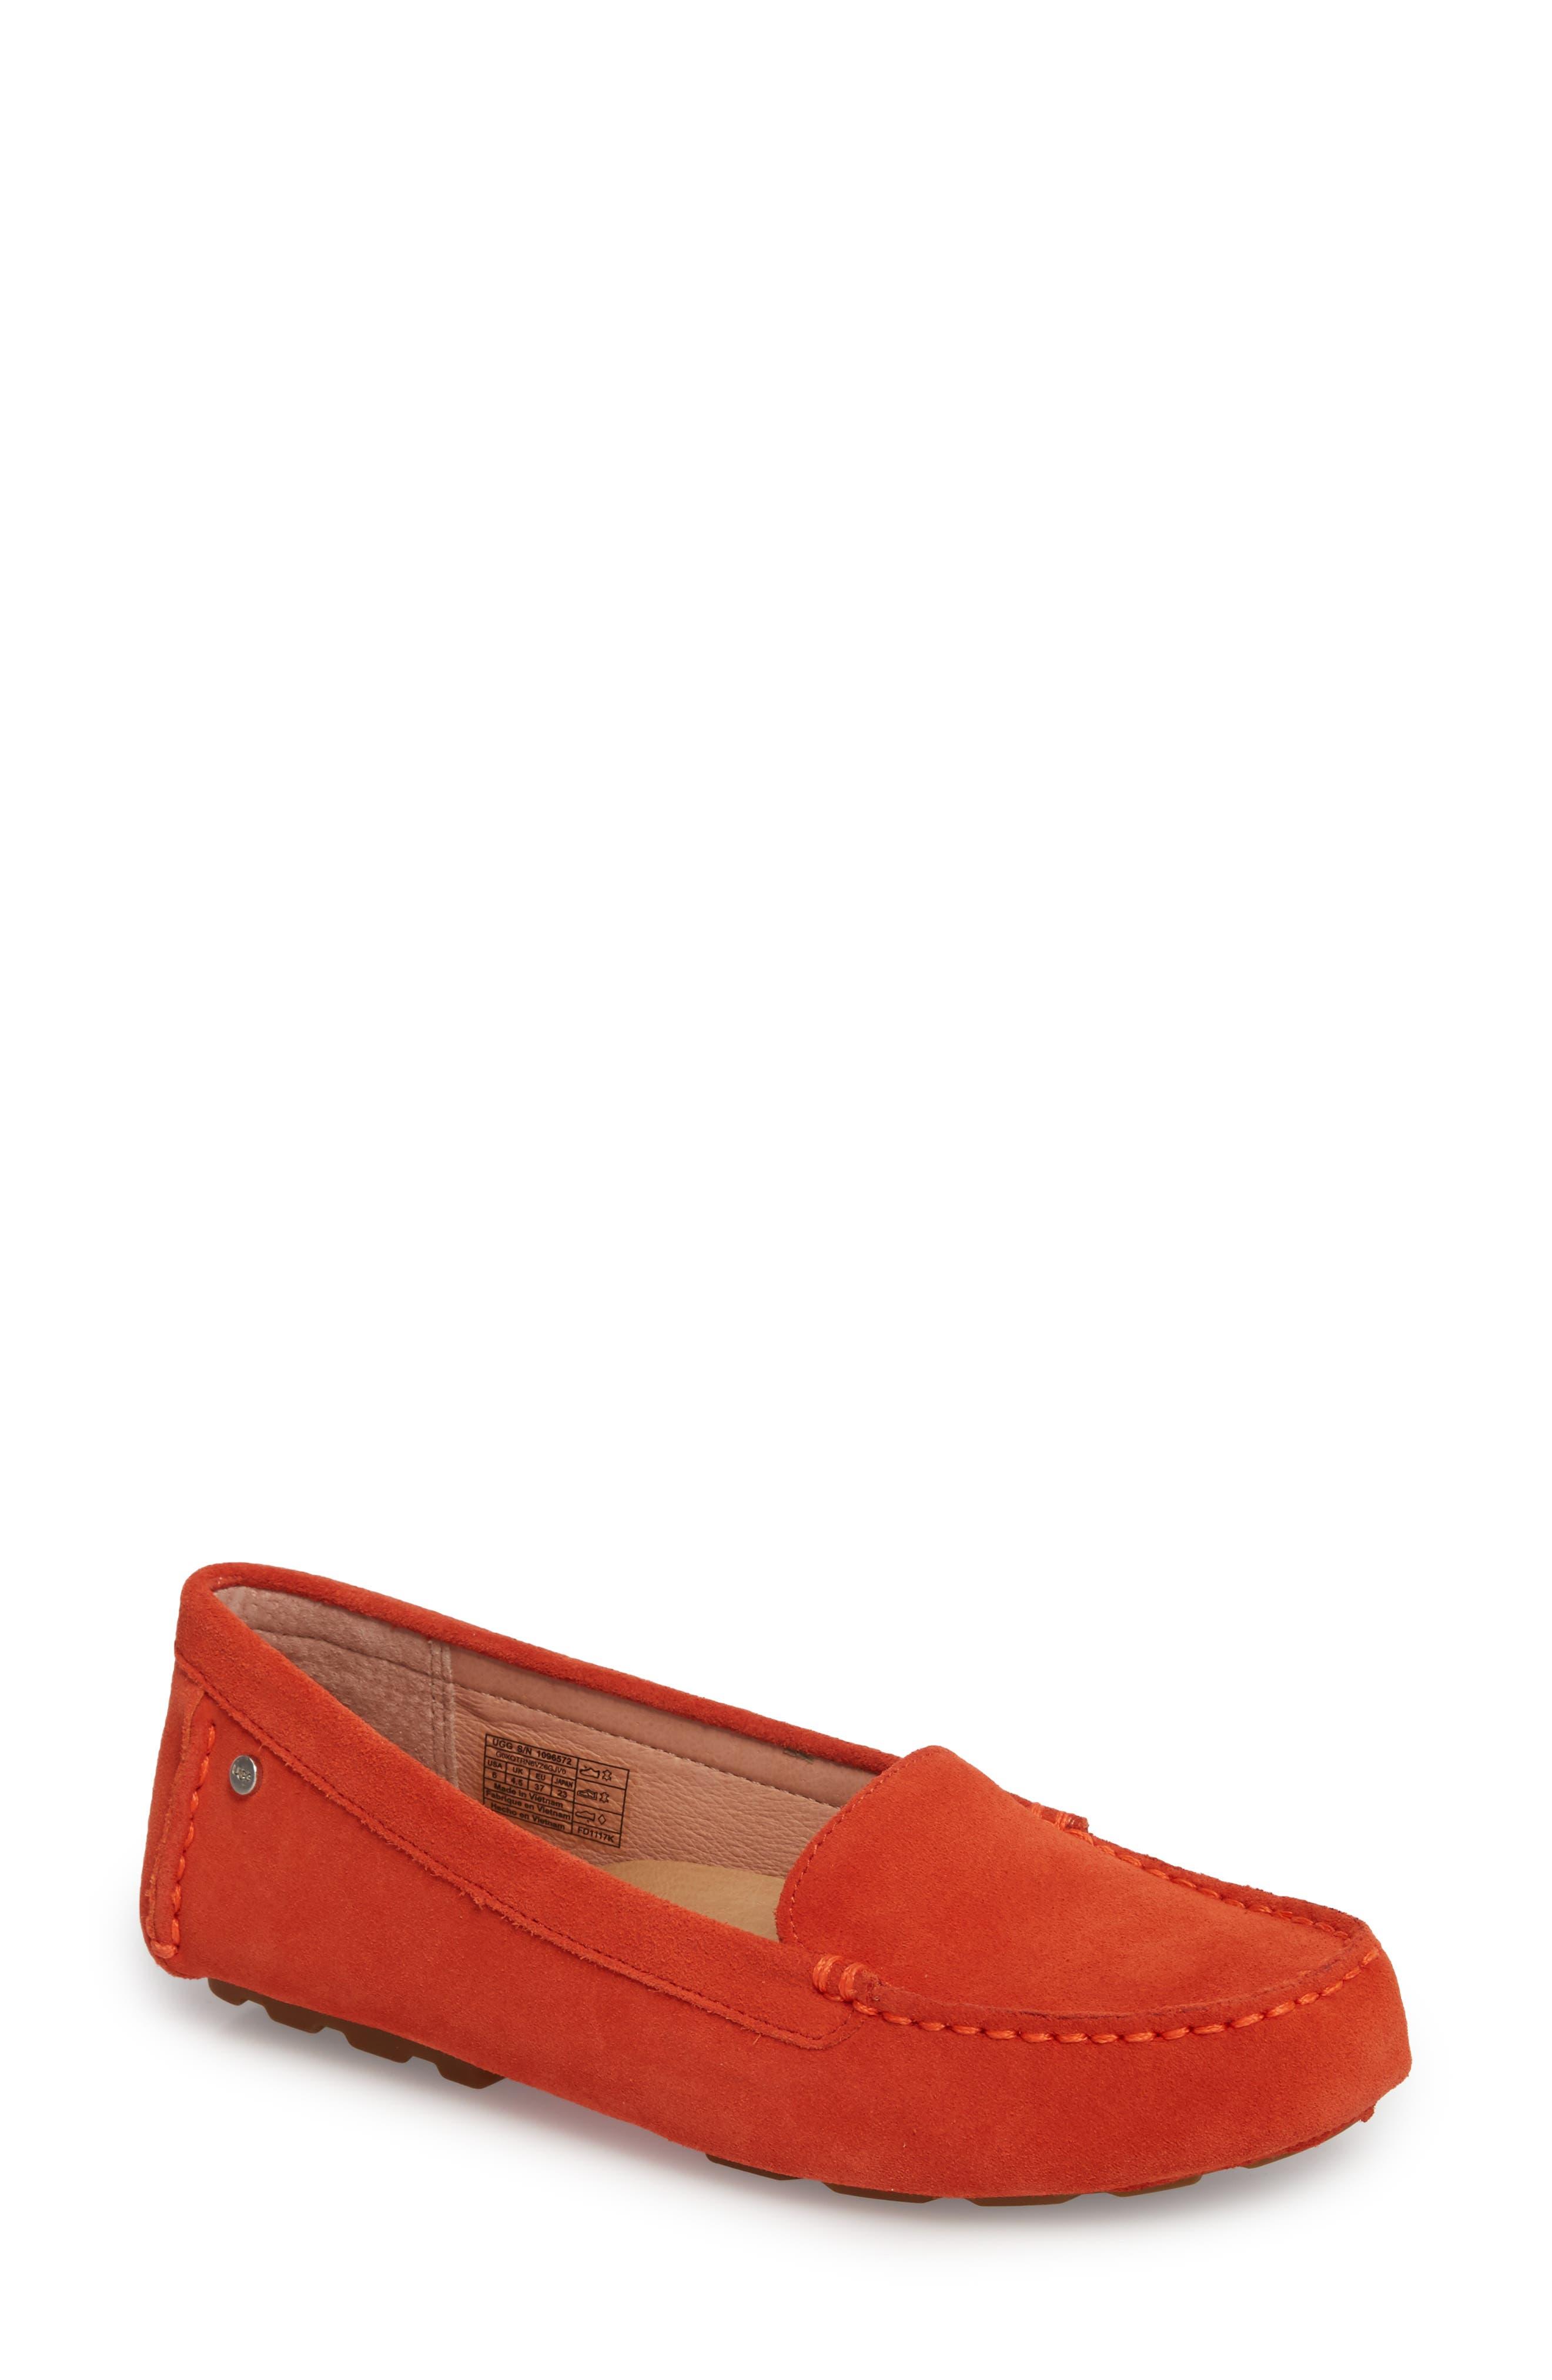 Milana Loafer,                         Main,                         color, RED ORANGE SUEDE